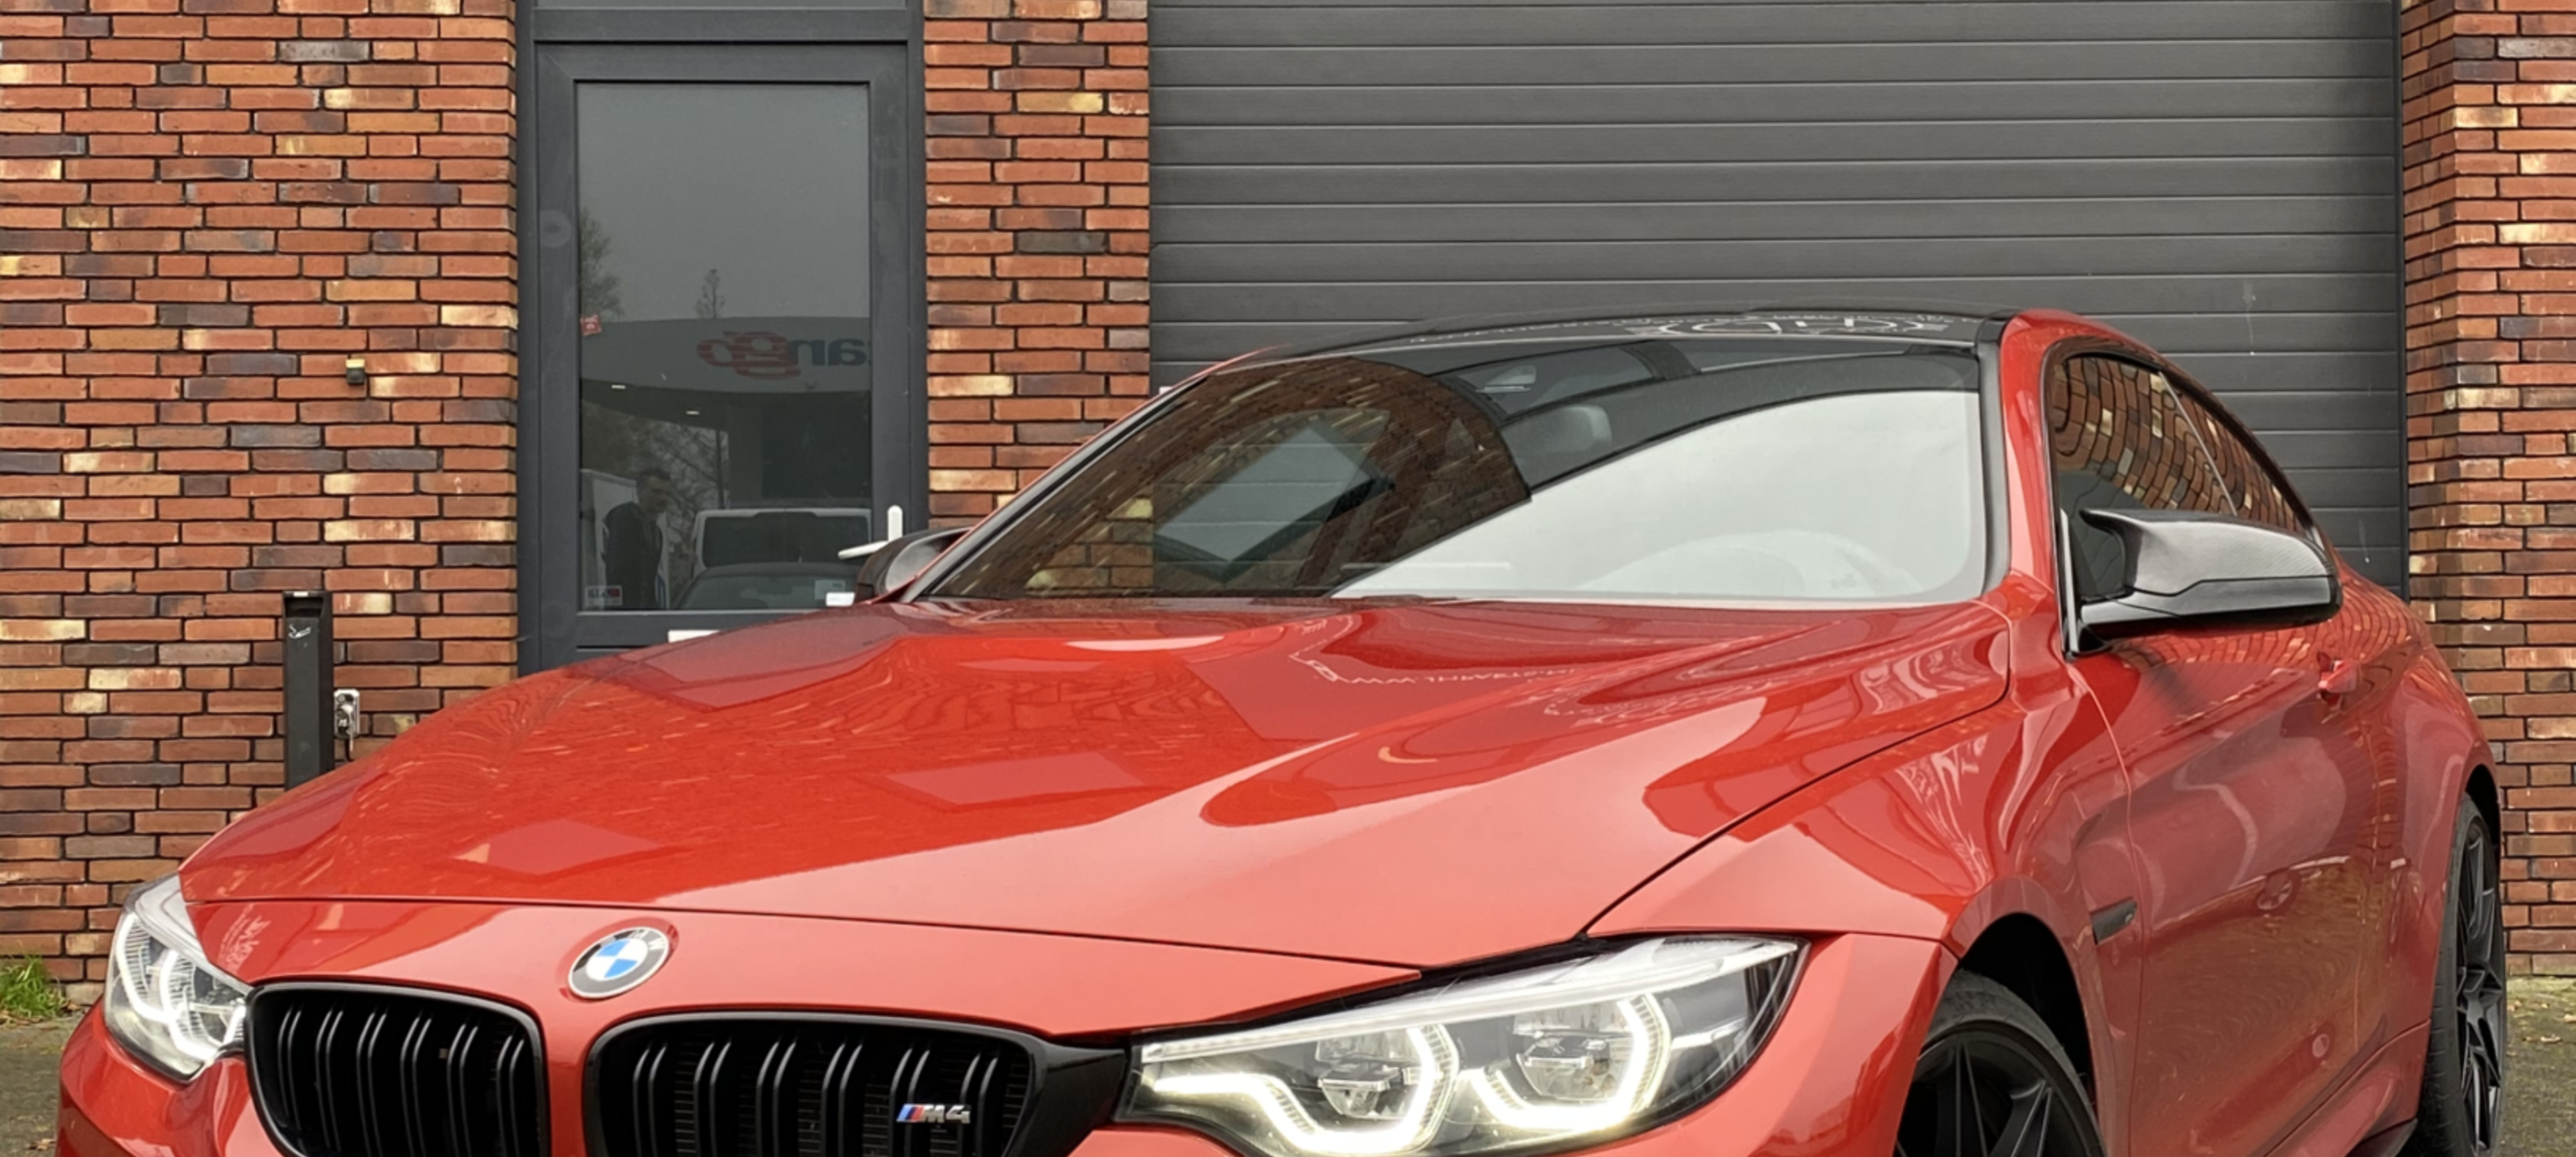 BMW F82 M4 Carbon performance kit